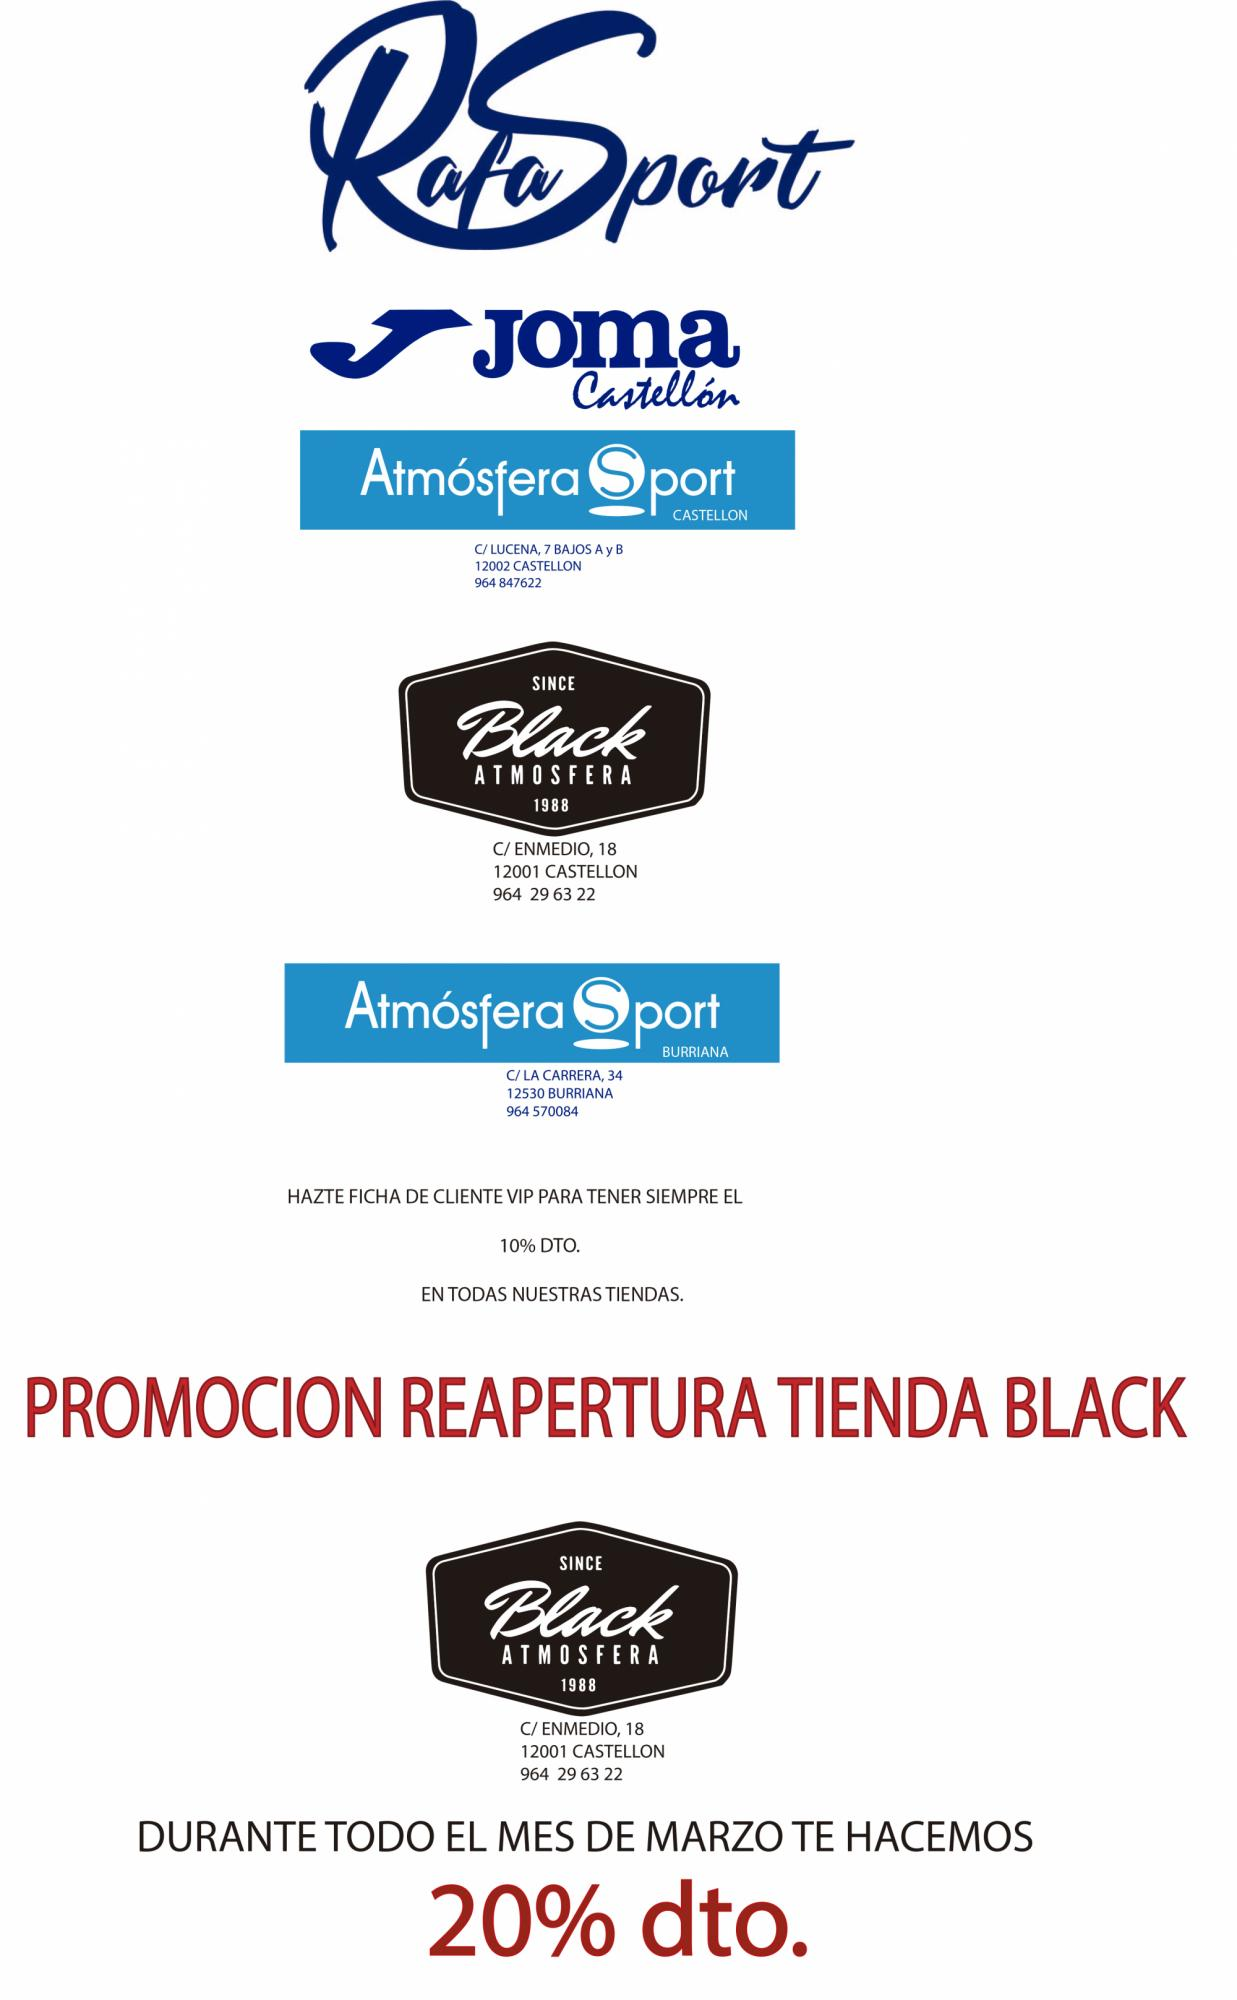 BANNER-PROMO-REAPERTURA-BLACK